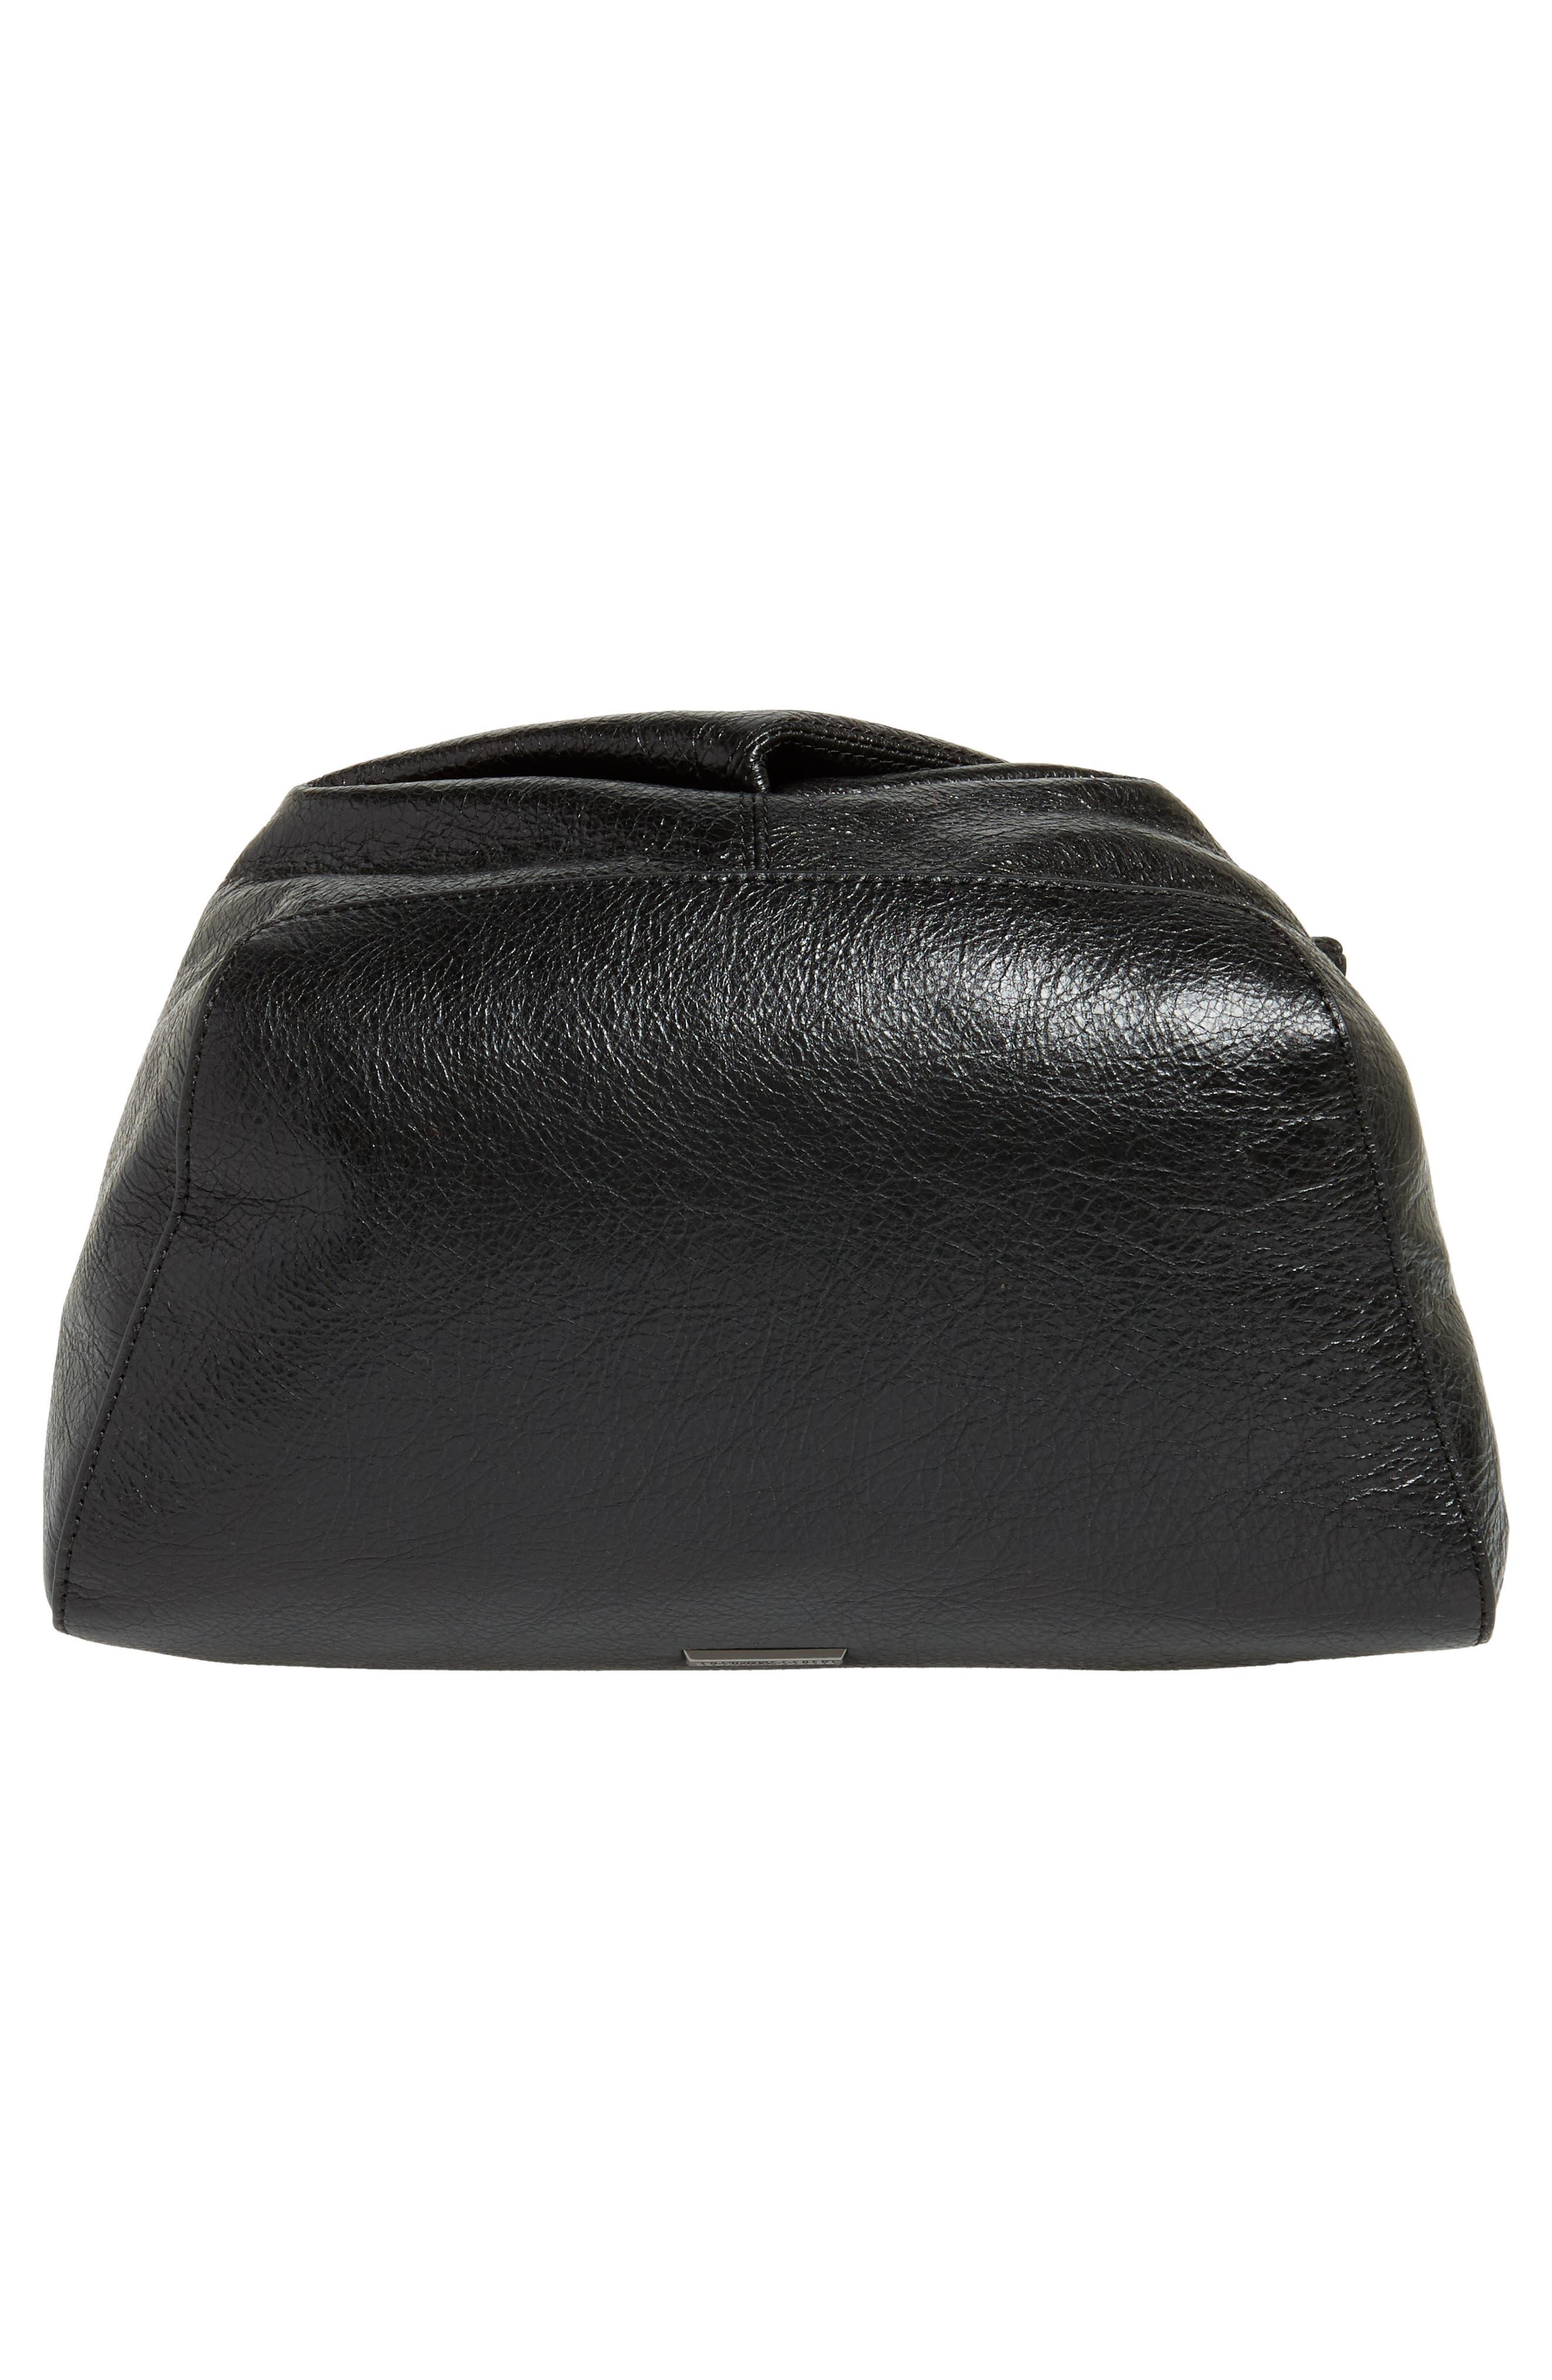 Jamie Nubuck Leather Backpack,                             Alternate thumbnail 6, color,                             001